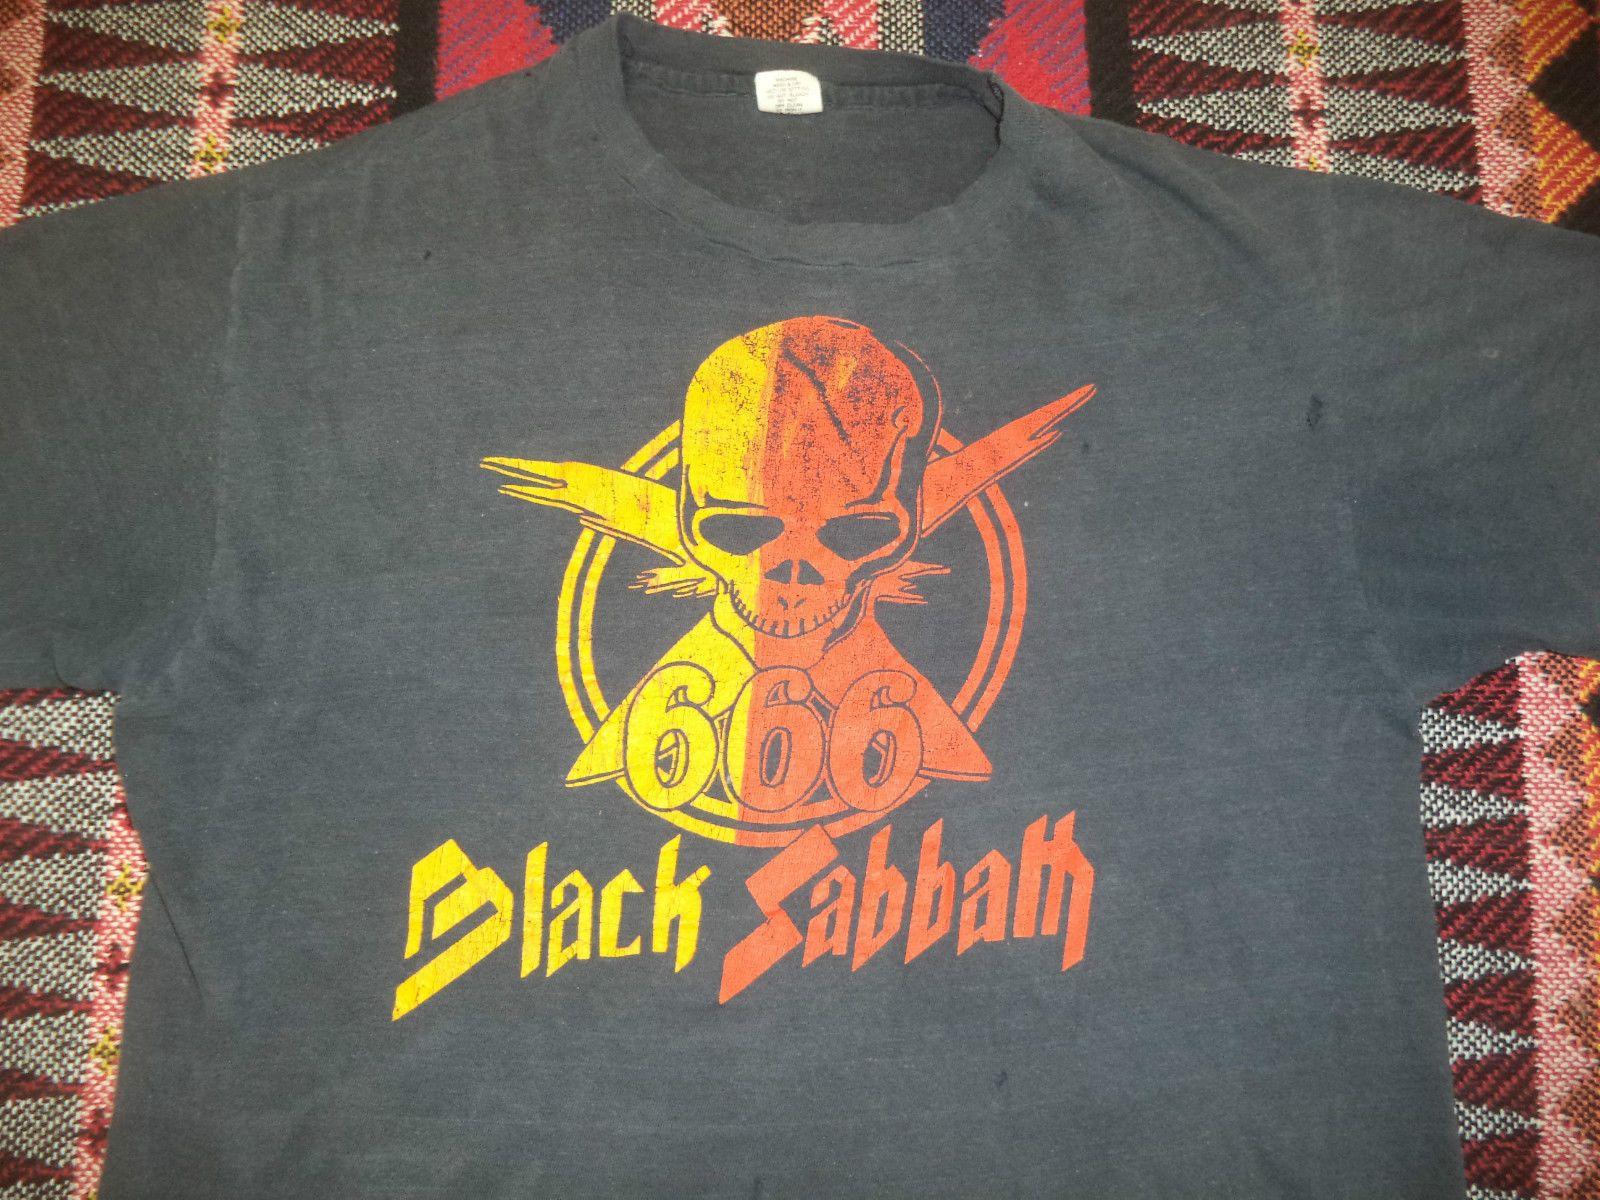 Black sabbath t shirt etsy - Vtg 70s Black Sabbath 666 Rock Promo Tour Concert T Shirt S M Made Usa